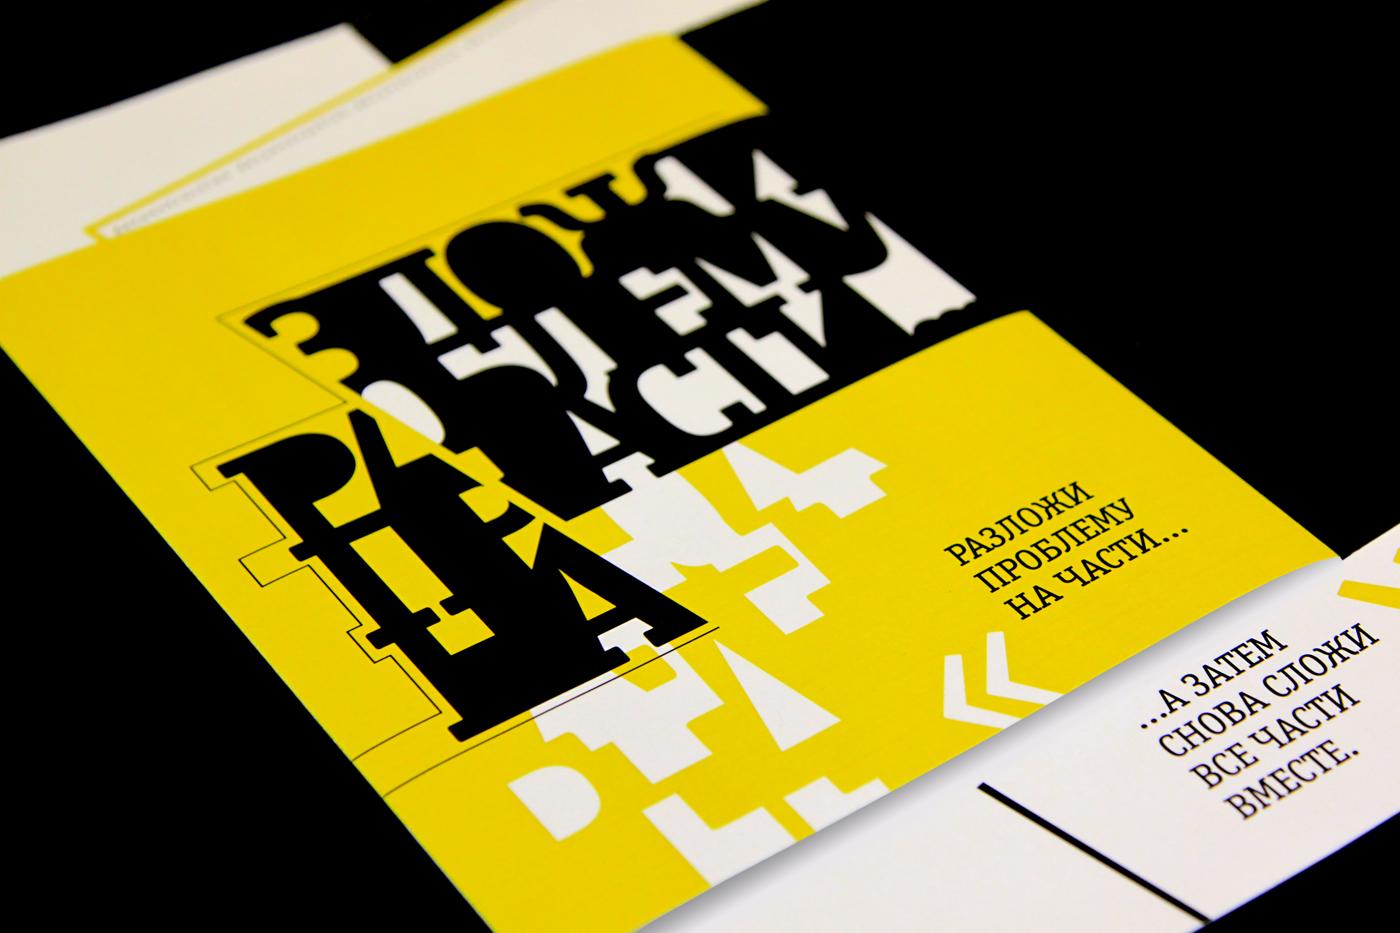 Conceptuall typography (Erik Spiekermann excerption)